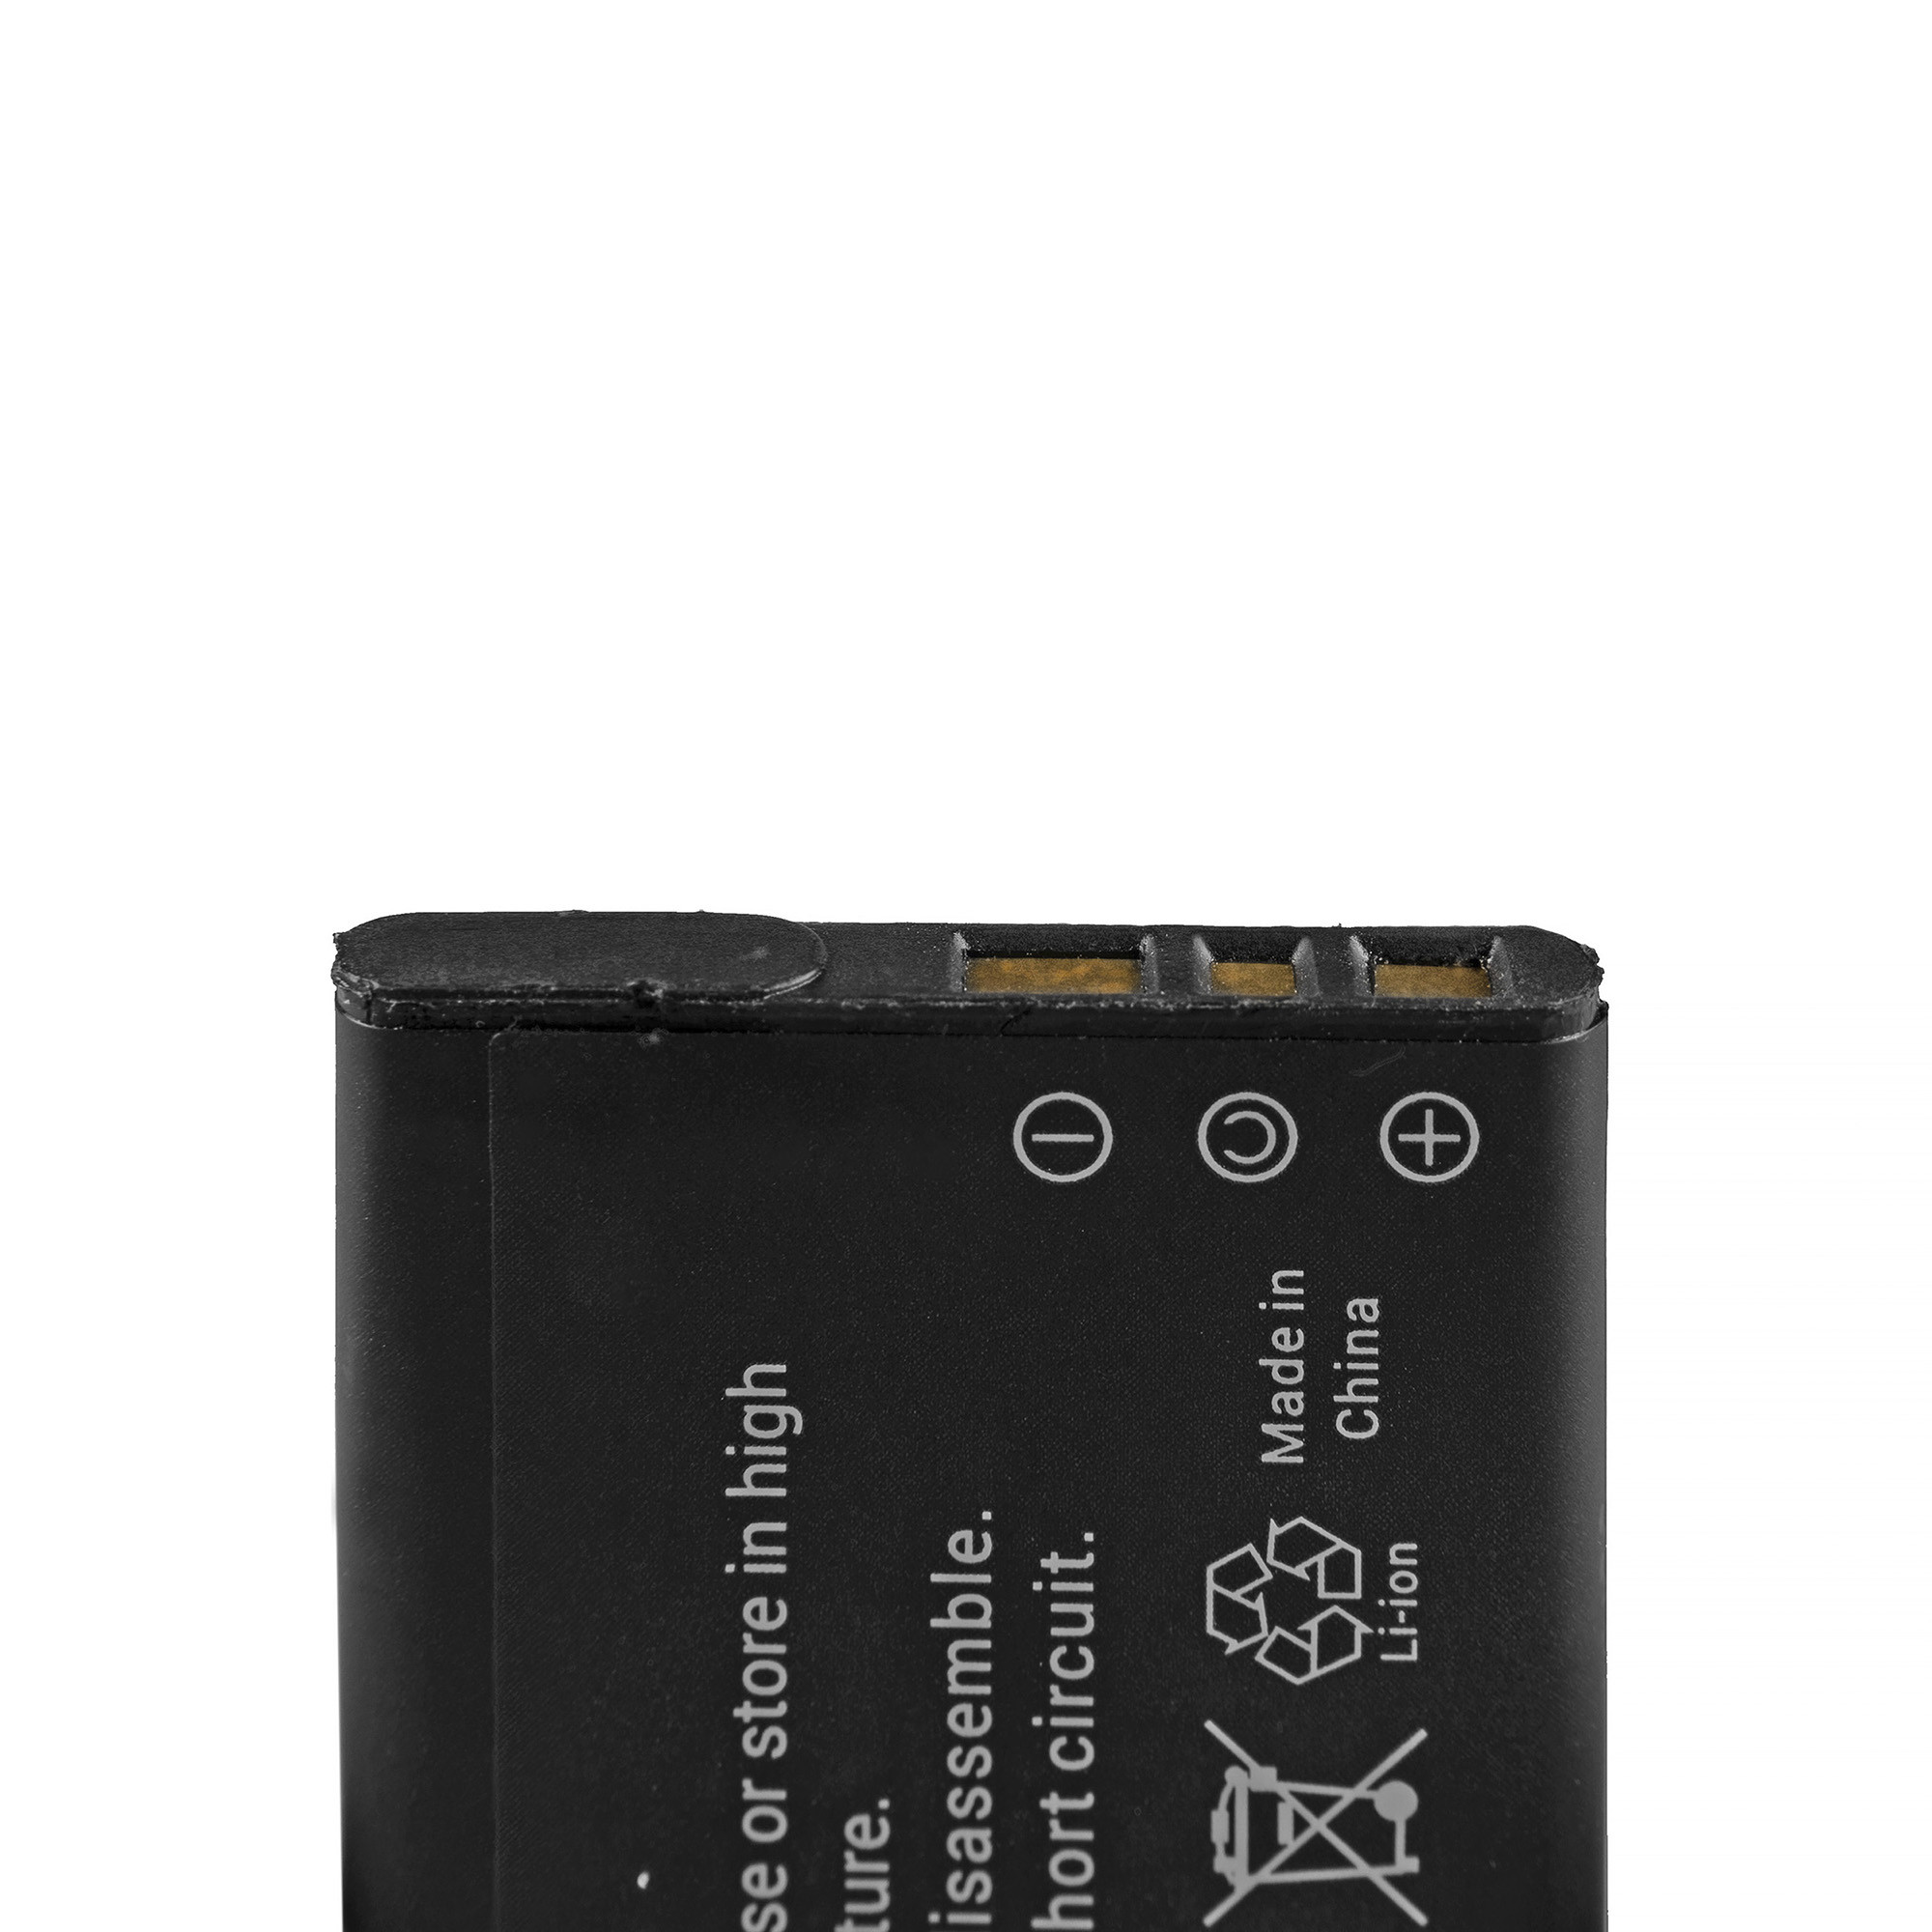 Green Cell Baterie NP-BN1 Sony Cyber-Shot DSC-QX10 DSC-QX100 DSC-TF1 DSC-TX10 DSC-W530 DSC-W650 DSC-W800 3.7V 630mAh